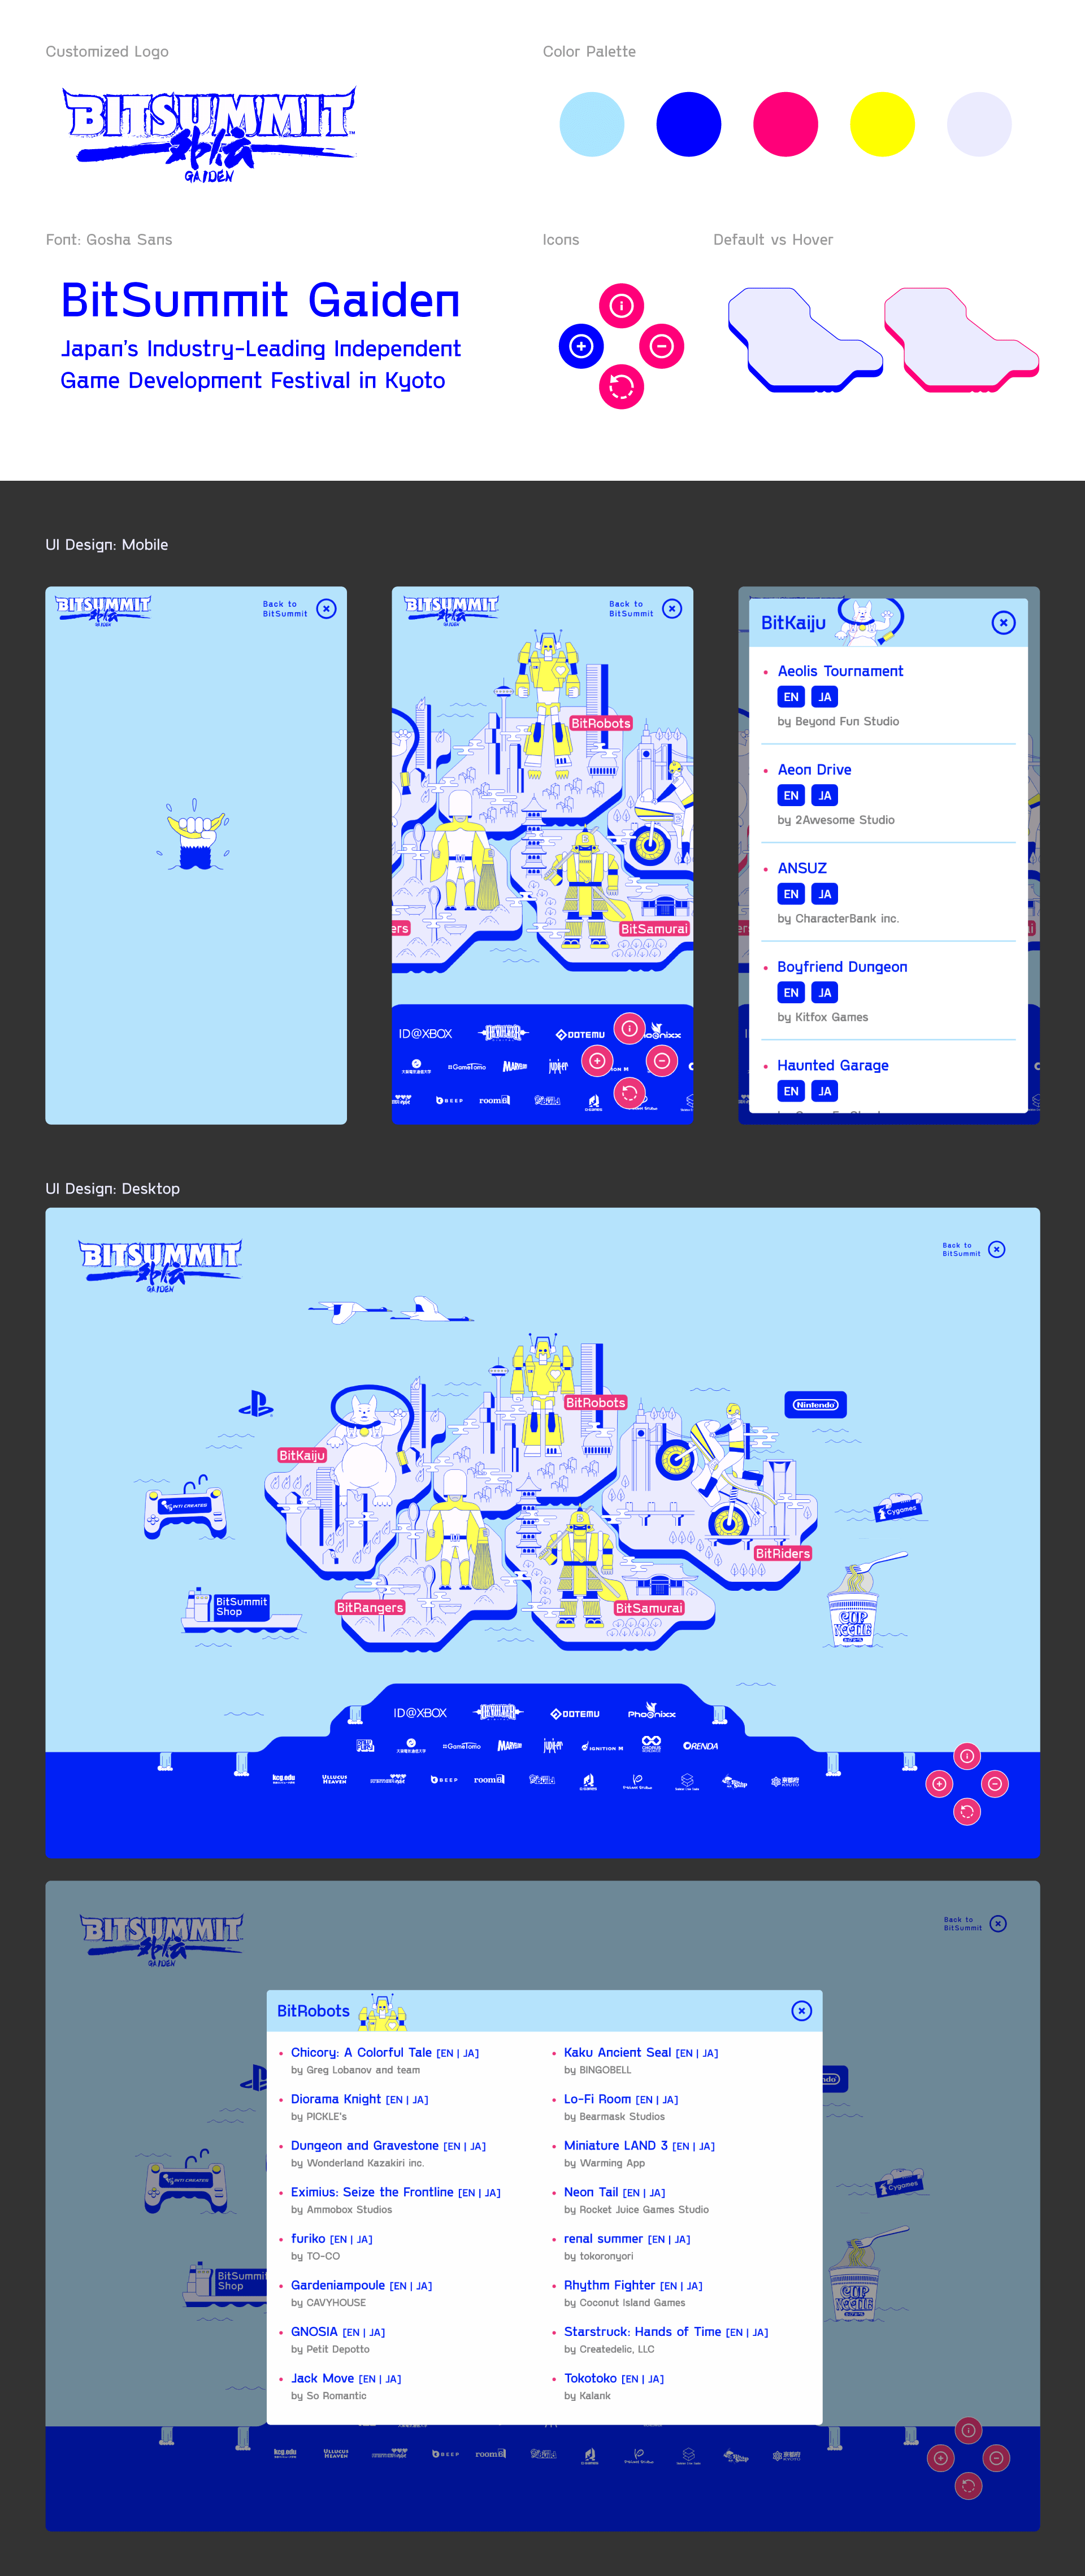 BitSummit Gaiden 2020 - Branding, Styling and UI/UX Design